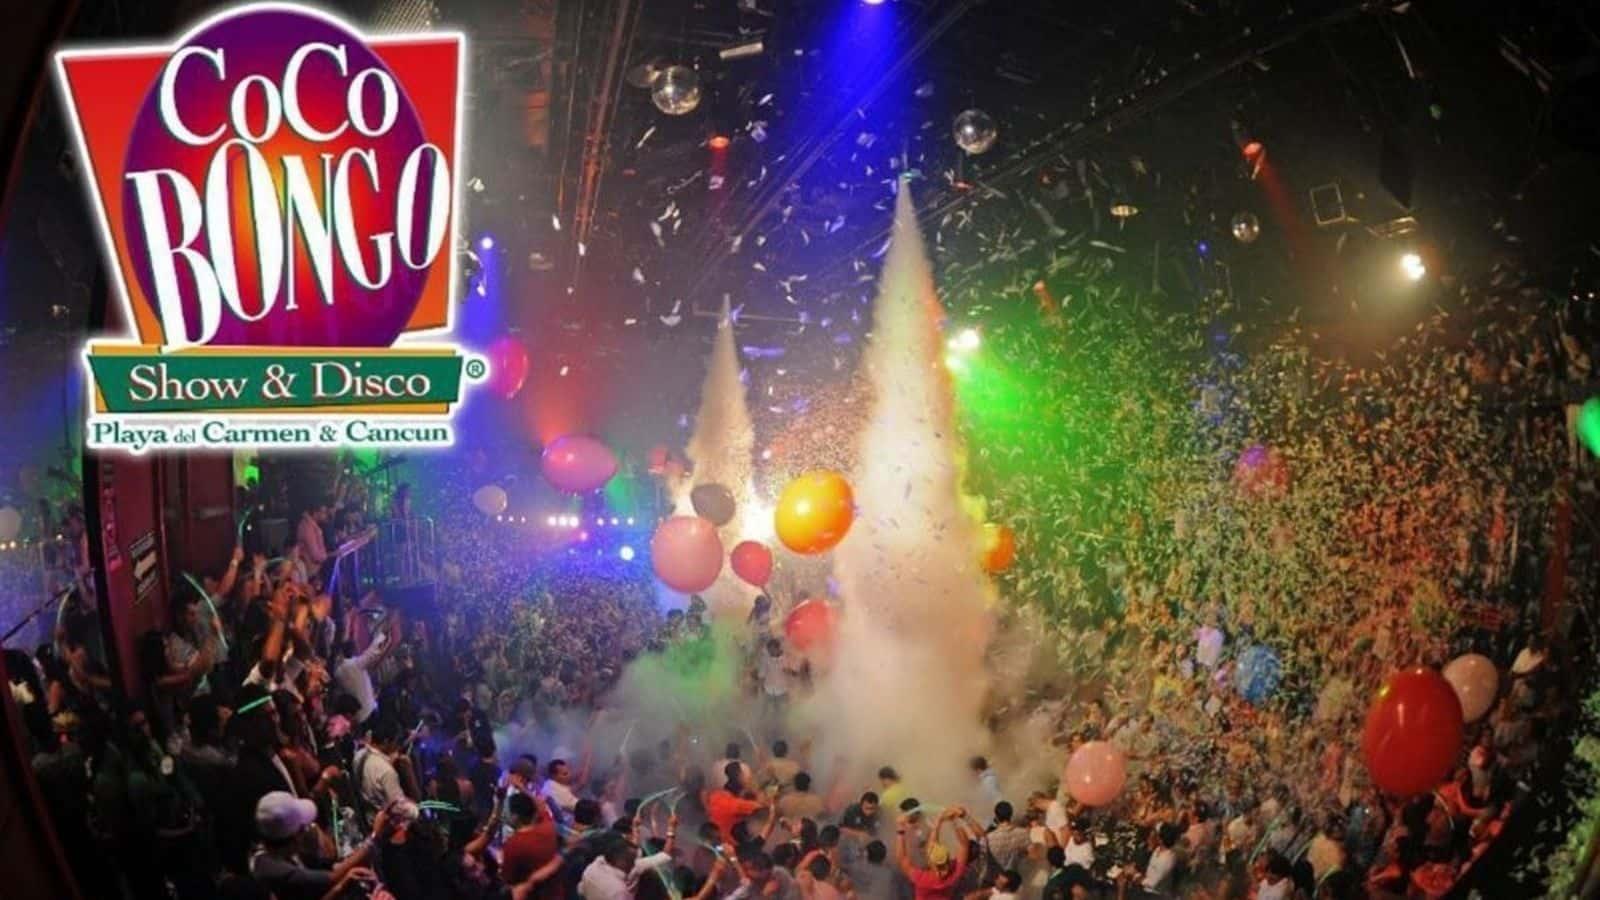 Discoteca Coco Bongo Show en Cancun